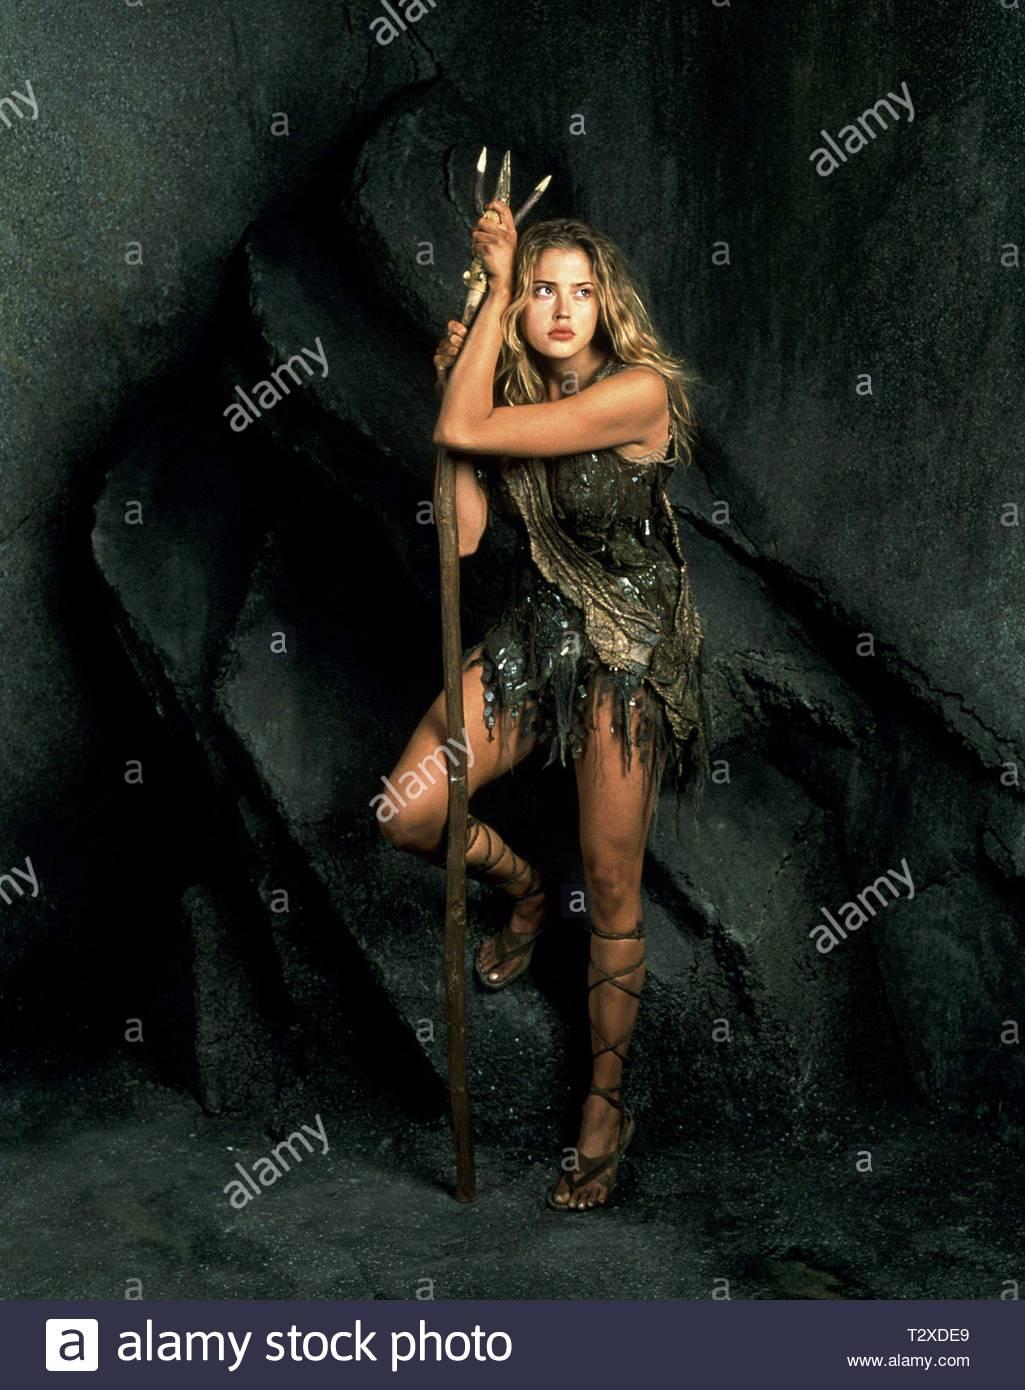 Estella Warren Planet Of The Apes 2001 Stock Photo Alamy